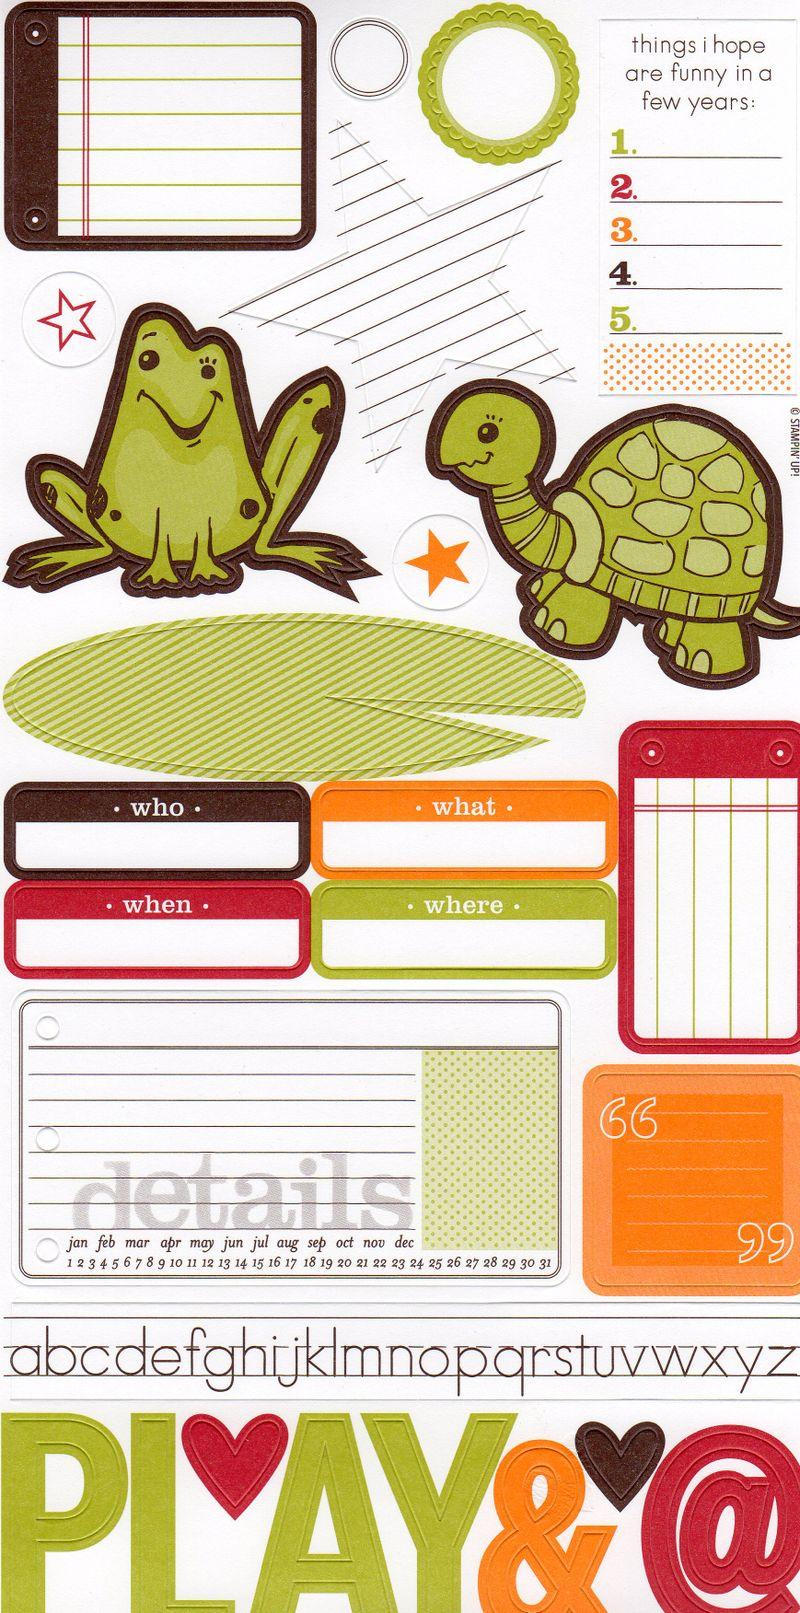 Memories Boardbook010